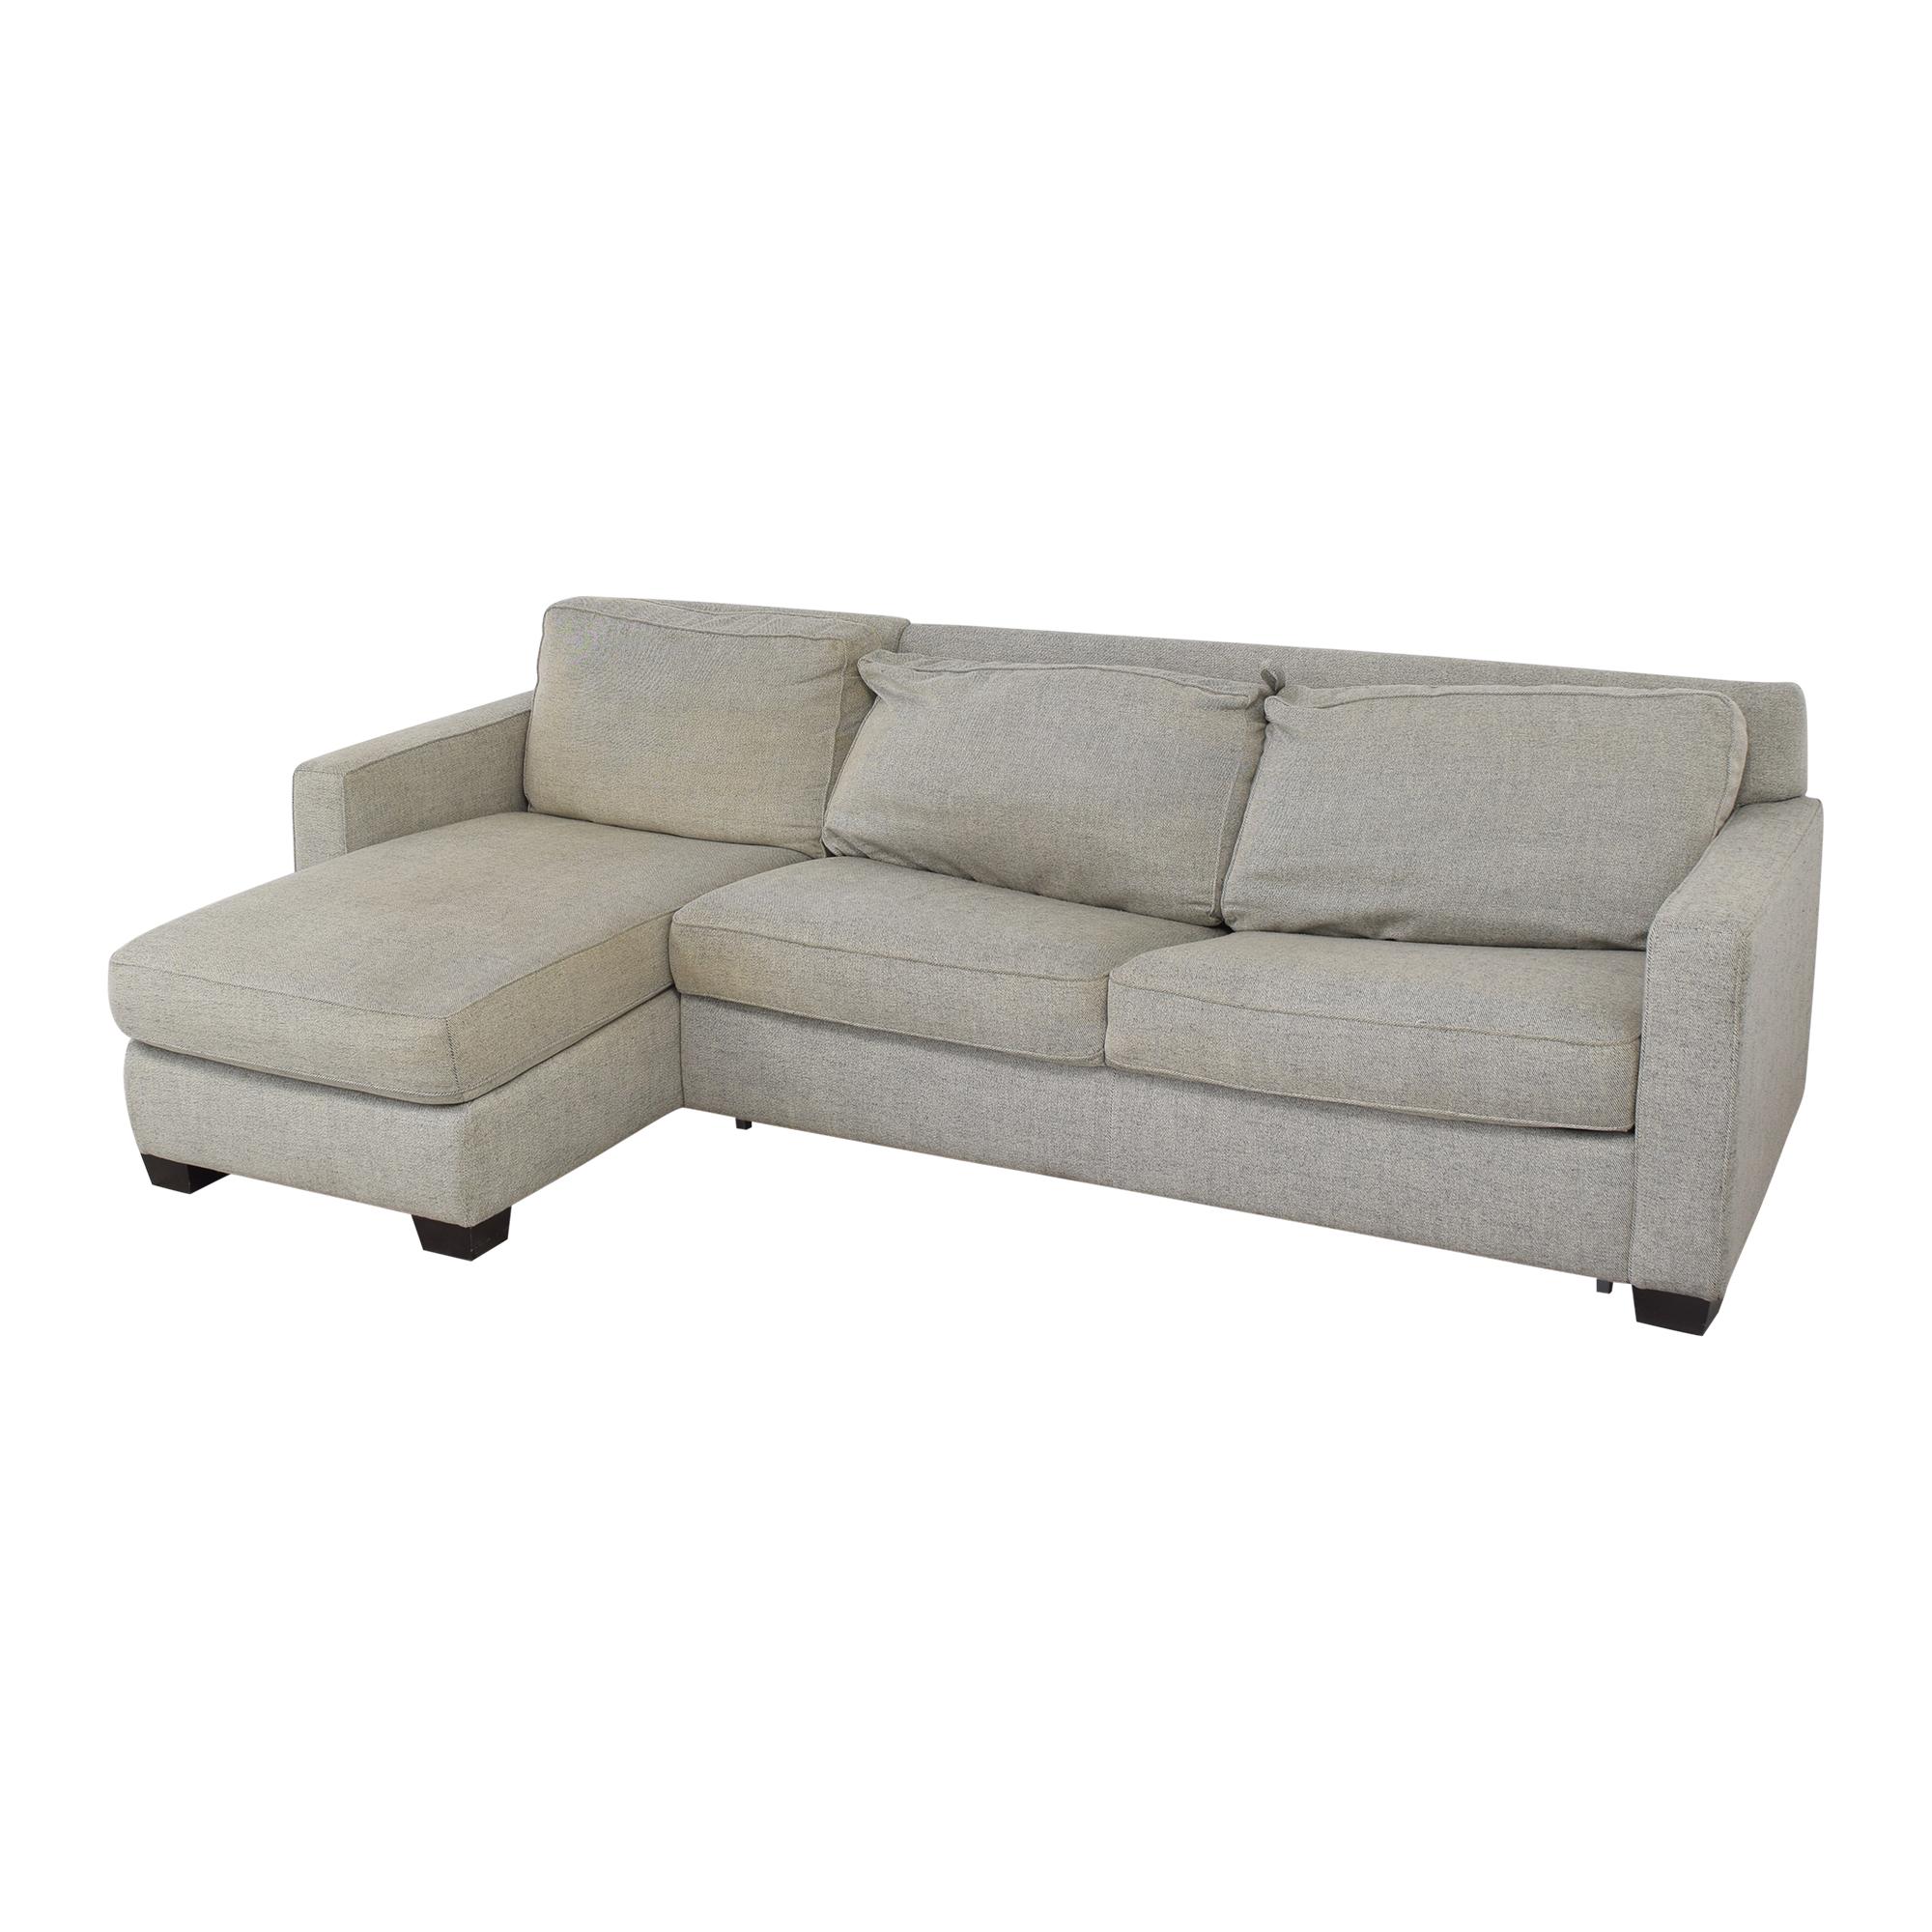 shop West Elm Henry 2-Piece Full Sleeper Storage Sofa West Elm Sofas